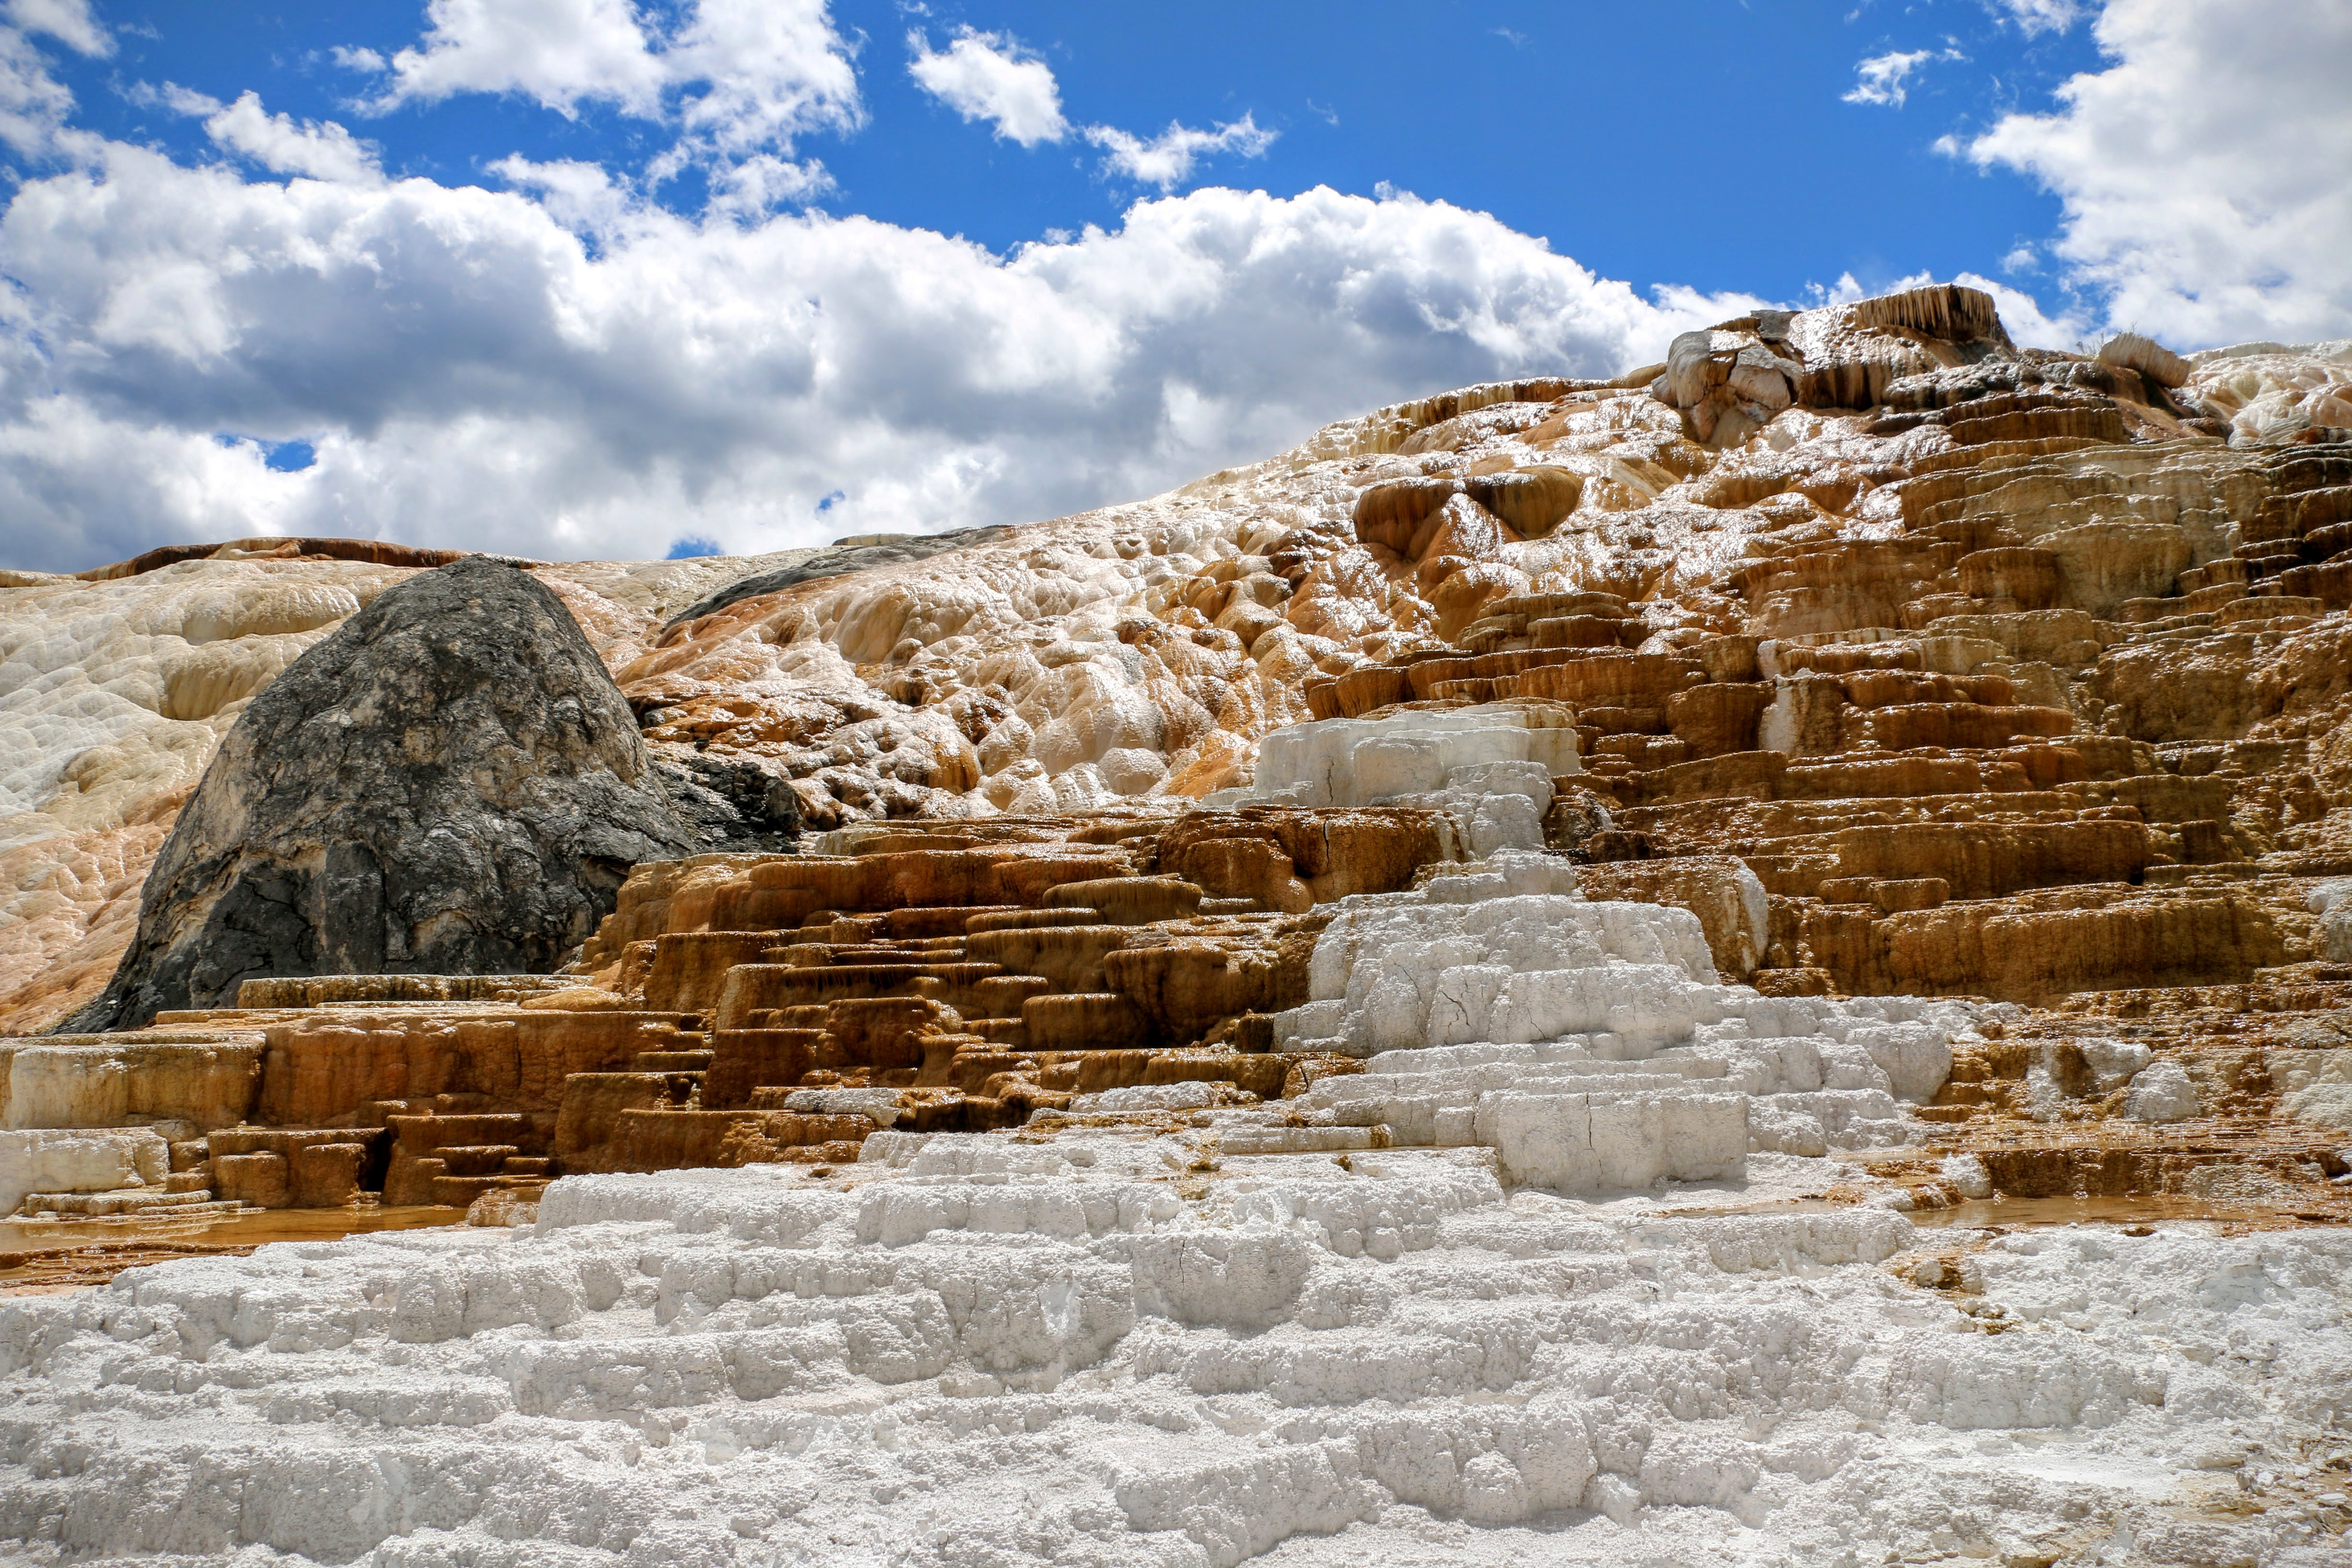 Sepulcher Mountain in Yellowstone Wyoming